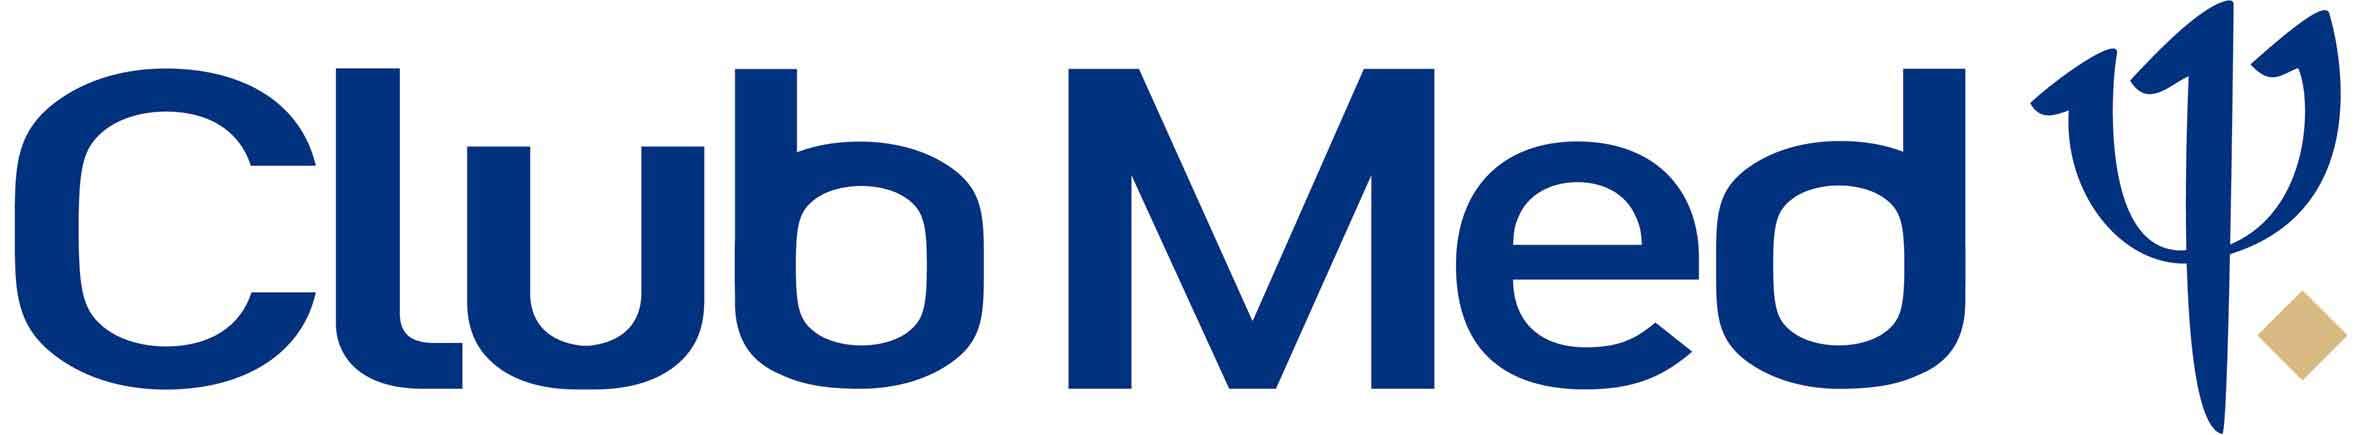 Logos Marques